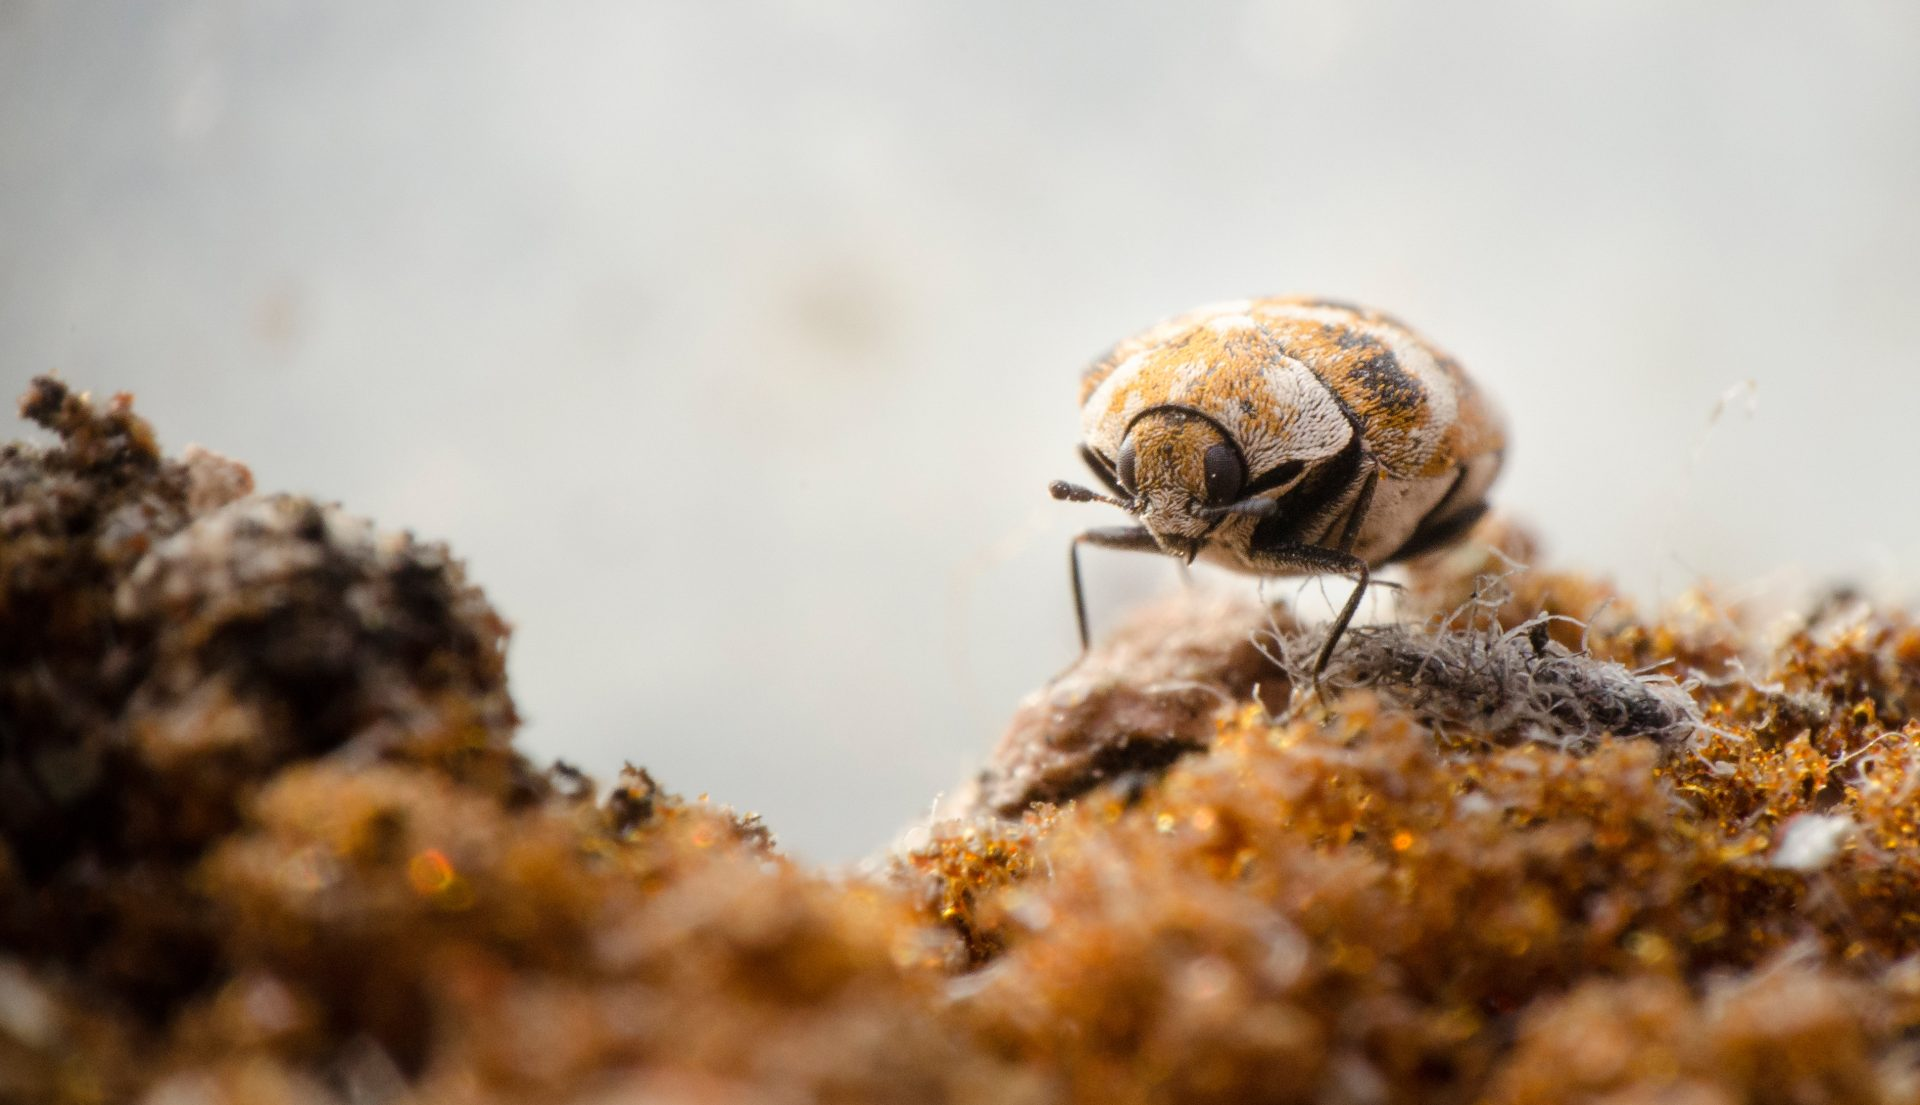 pest control in Annapolis - Raven Termite and Pest Control